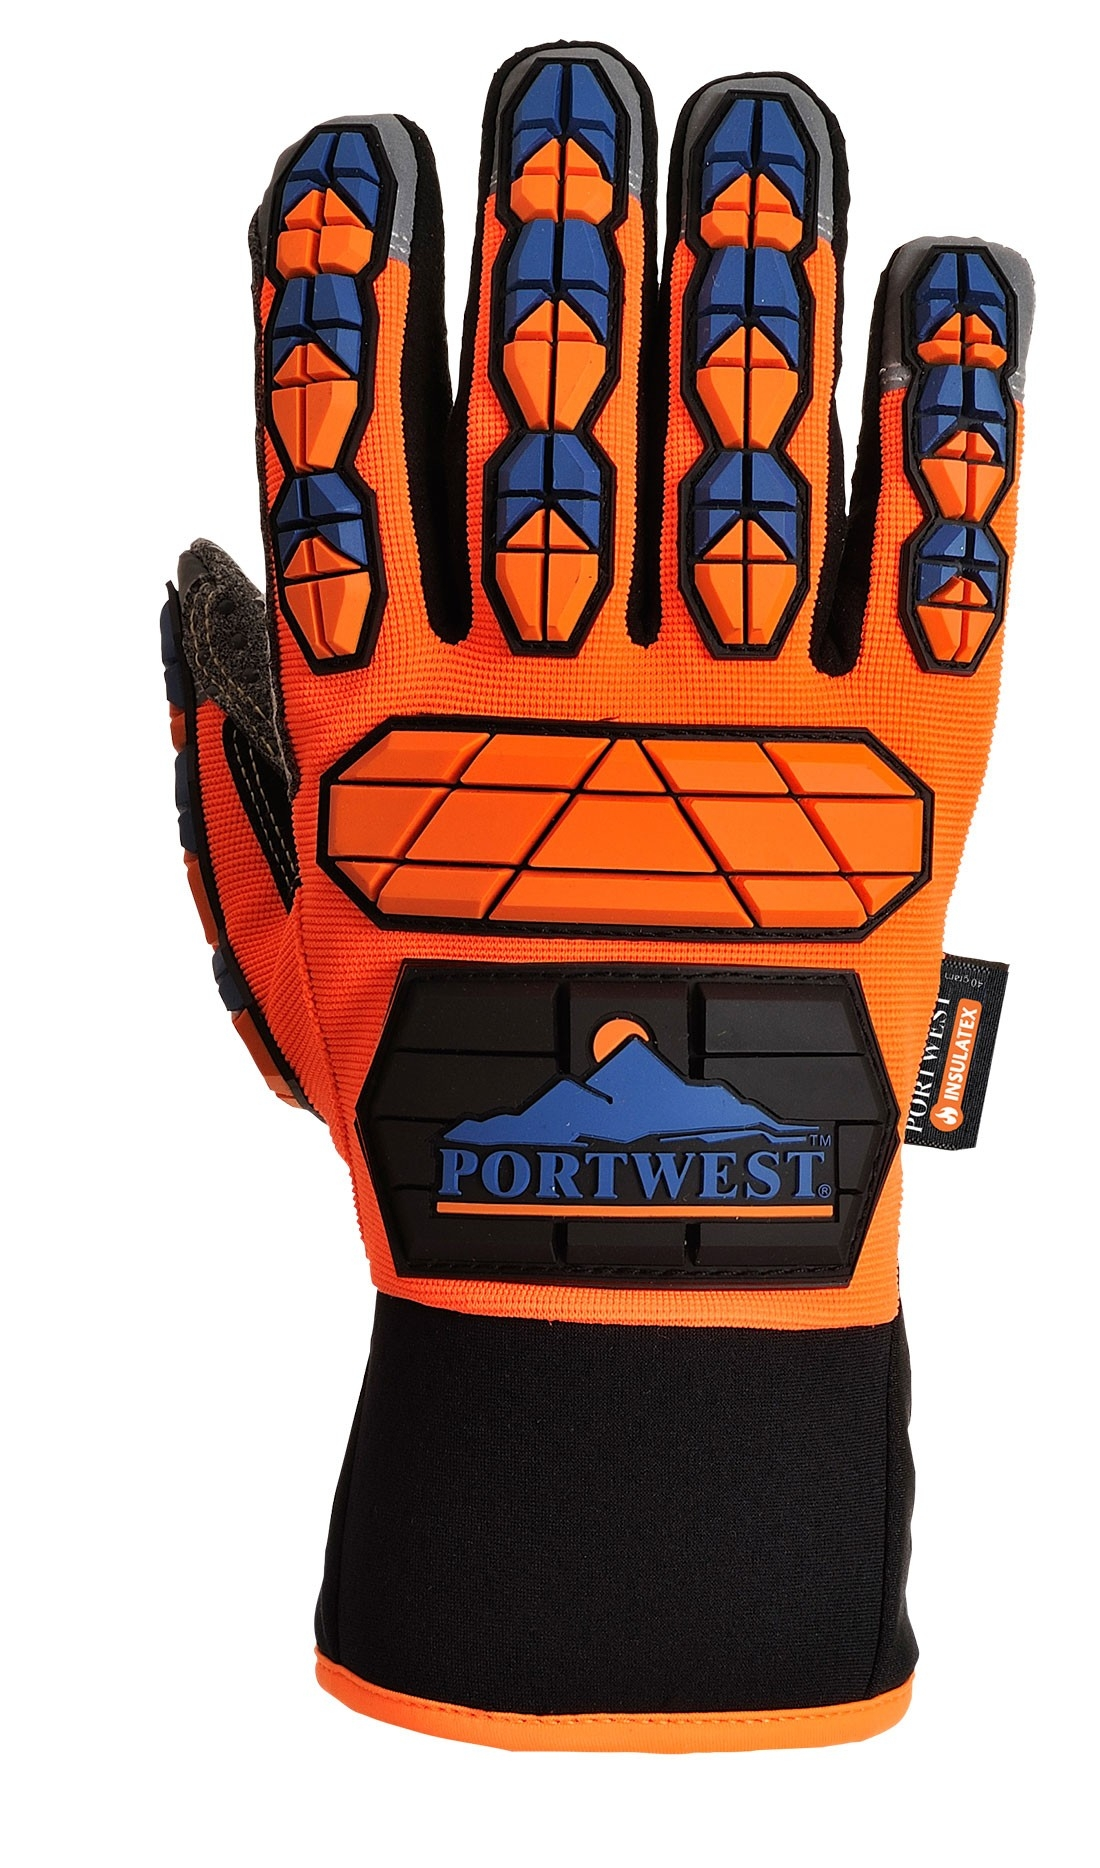 Portwest Aqua-Seal Pro Waterproof Glove - A726